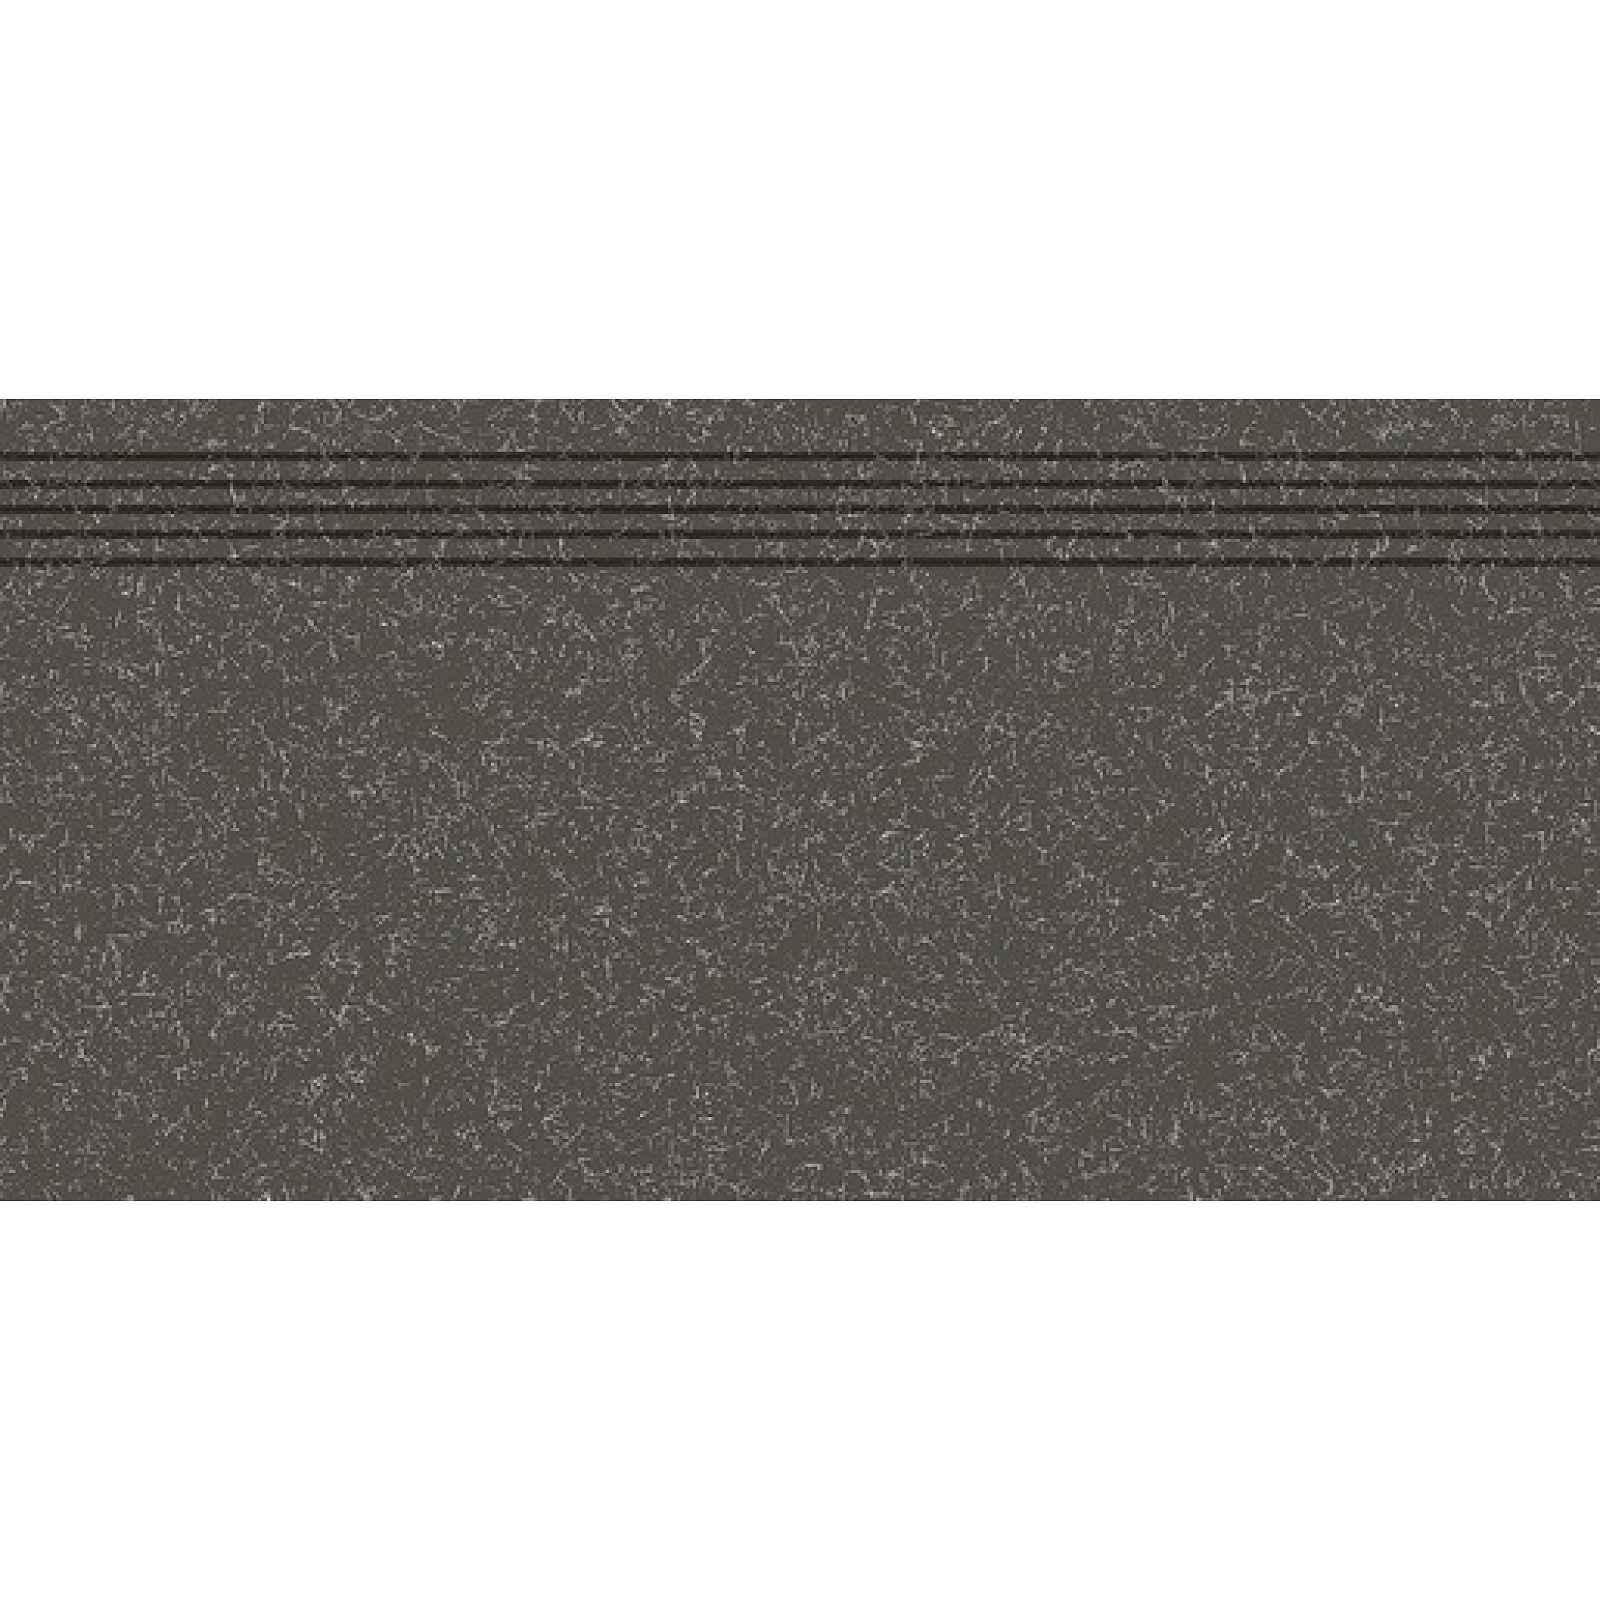 Schodovka RAKO Linka černá 30x60 cm mat DCPSE822.1